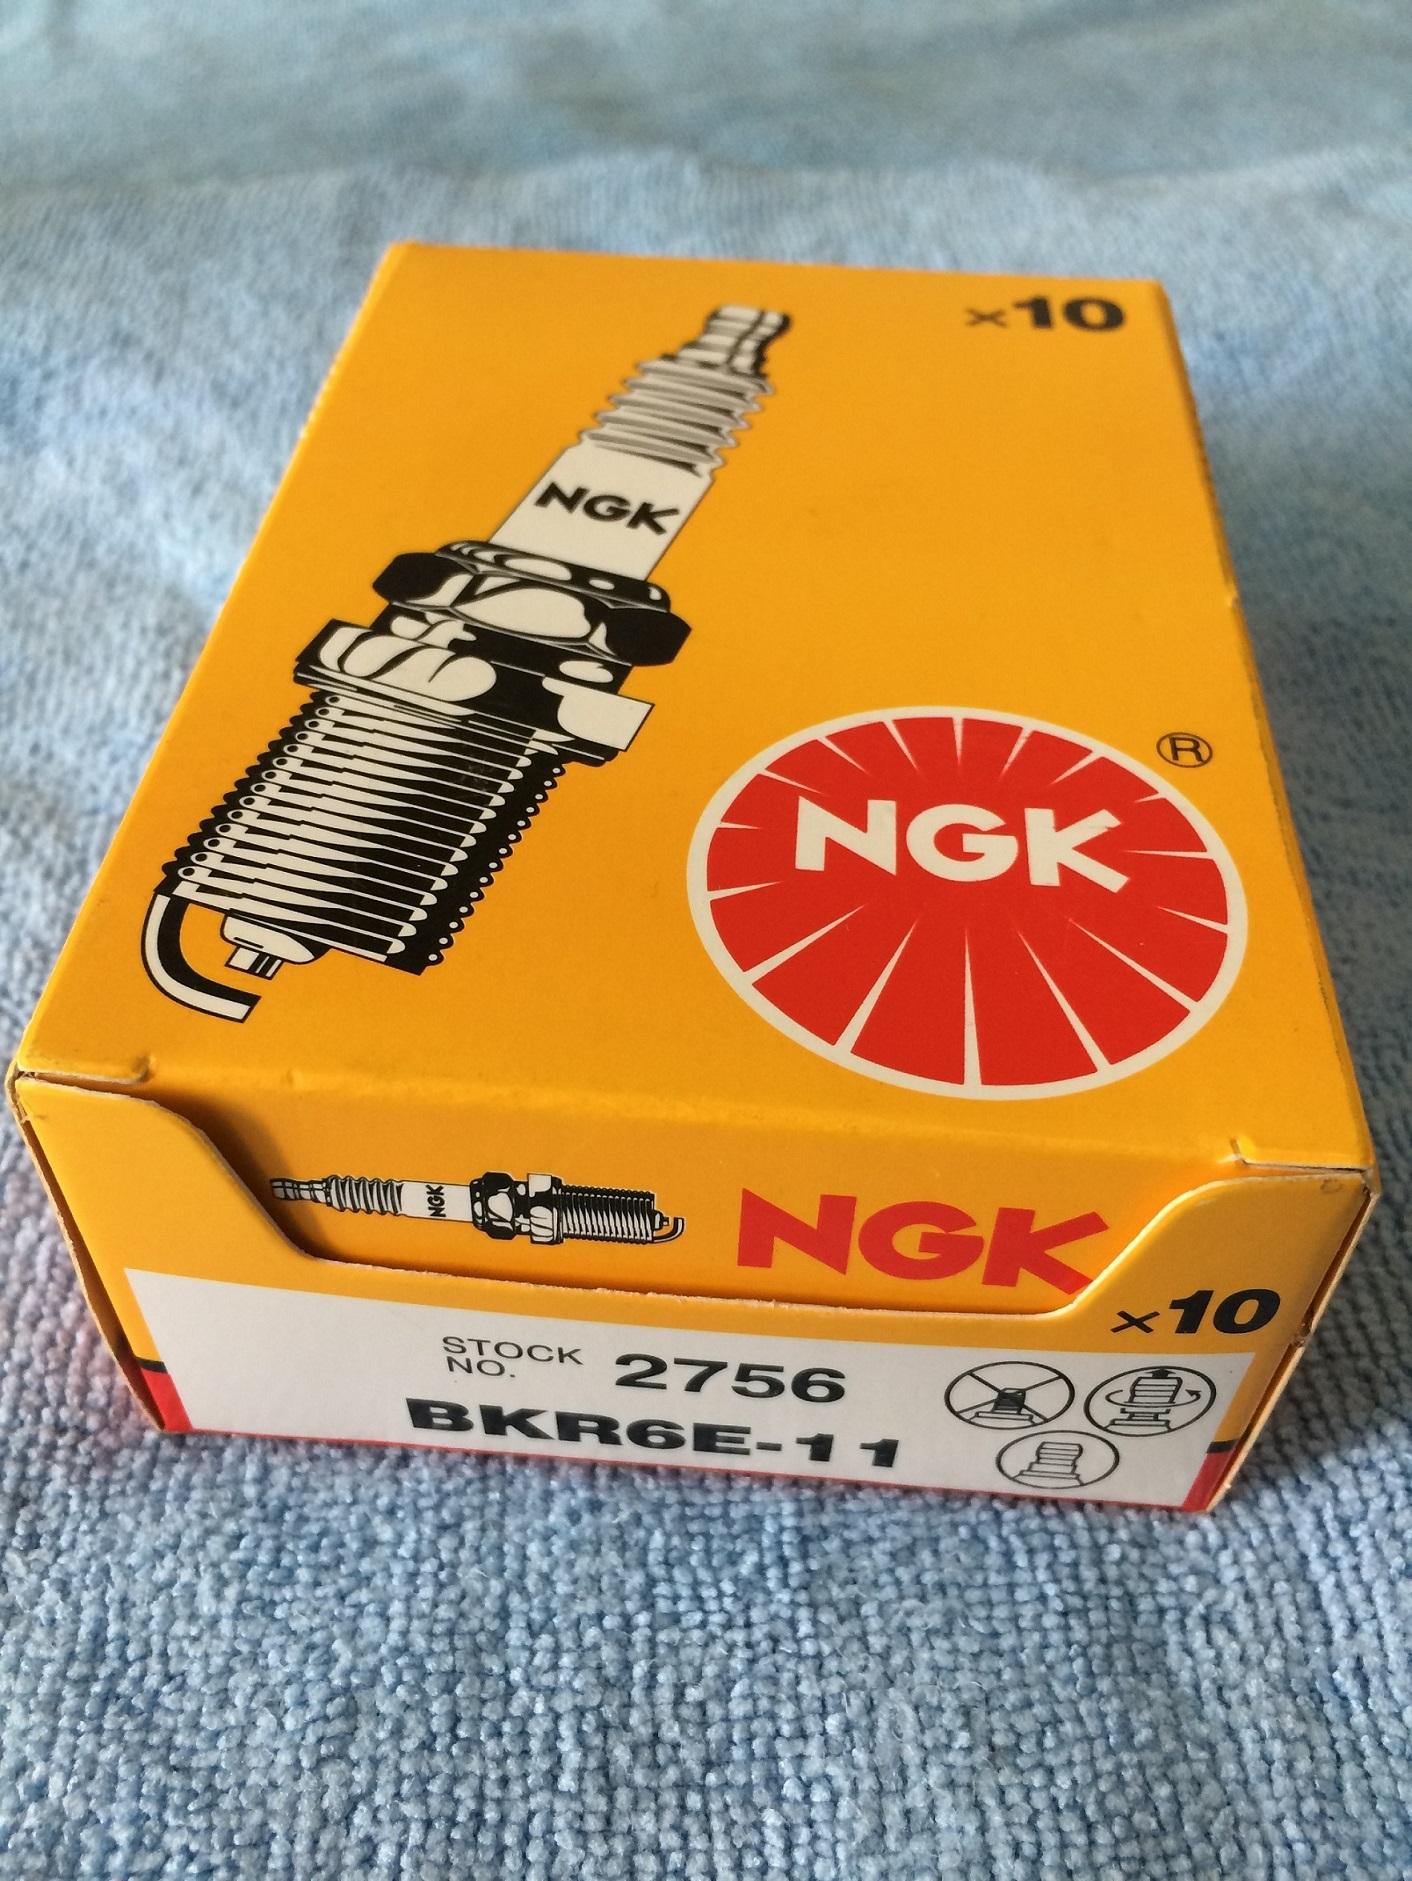 NGK OE# BKR6E-11 Spark Plug for Nissan Altima Sentra Infiniti QX4 22401-50Y06